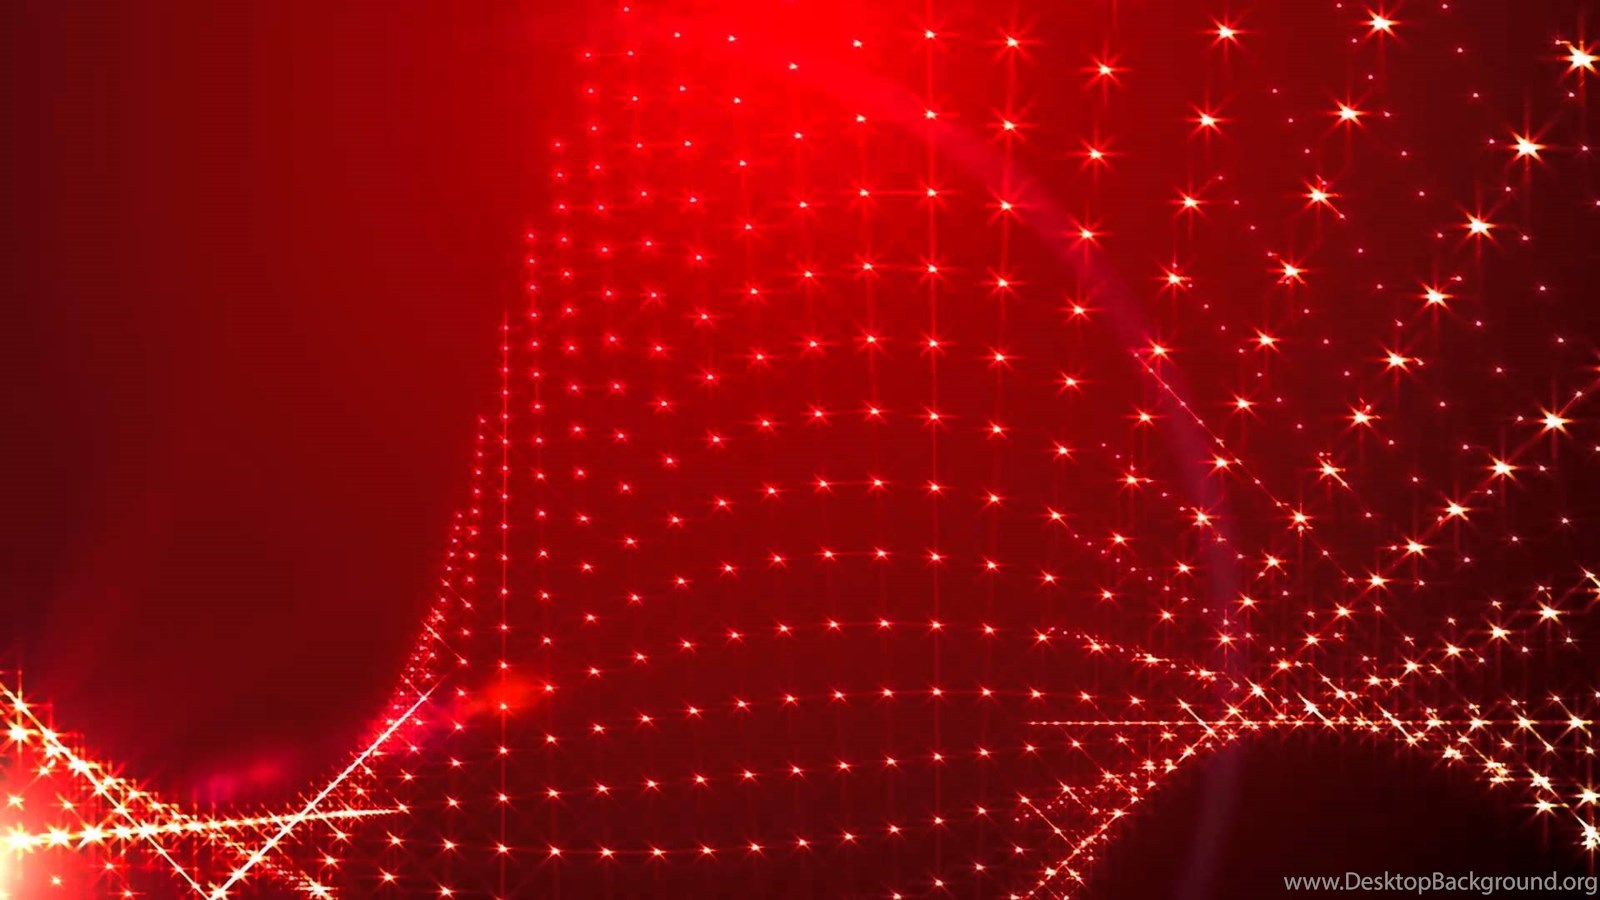 Red Backgrounds Light Beads Youtube Desktop Background